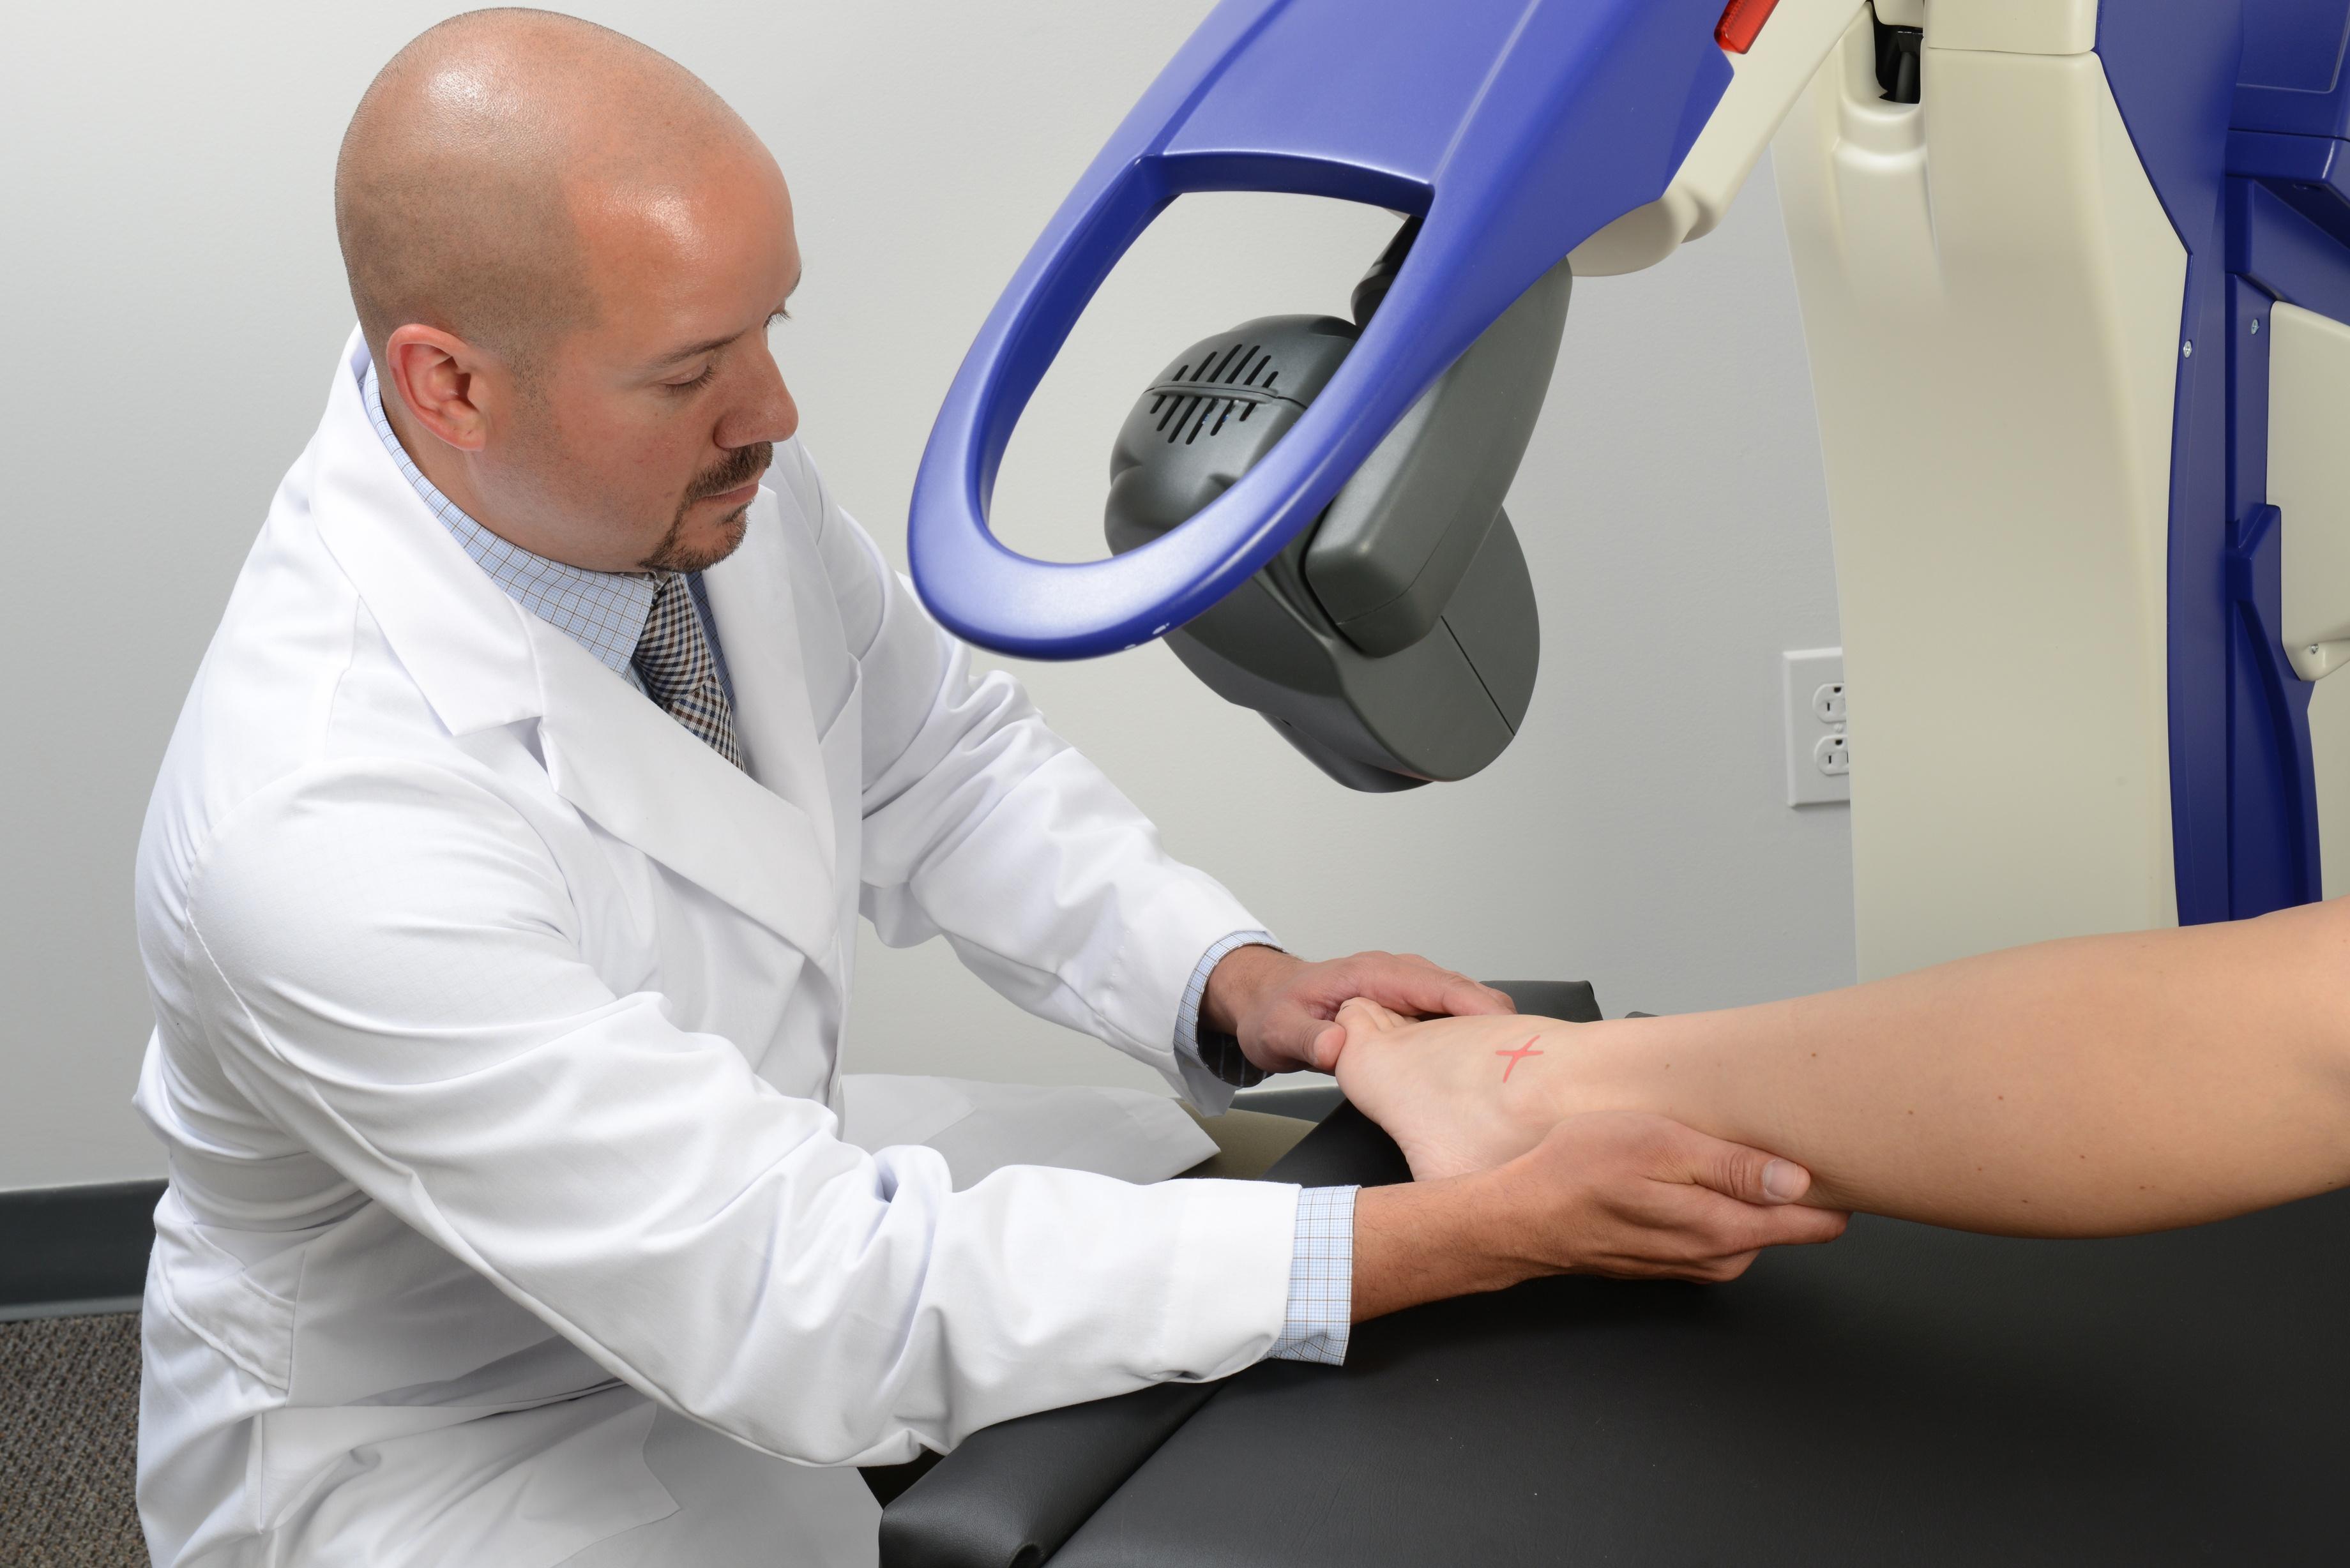 Laser Therapy plantar fasciitis.jpg